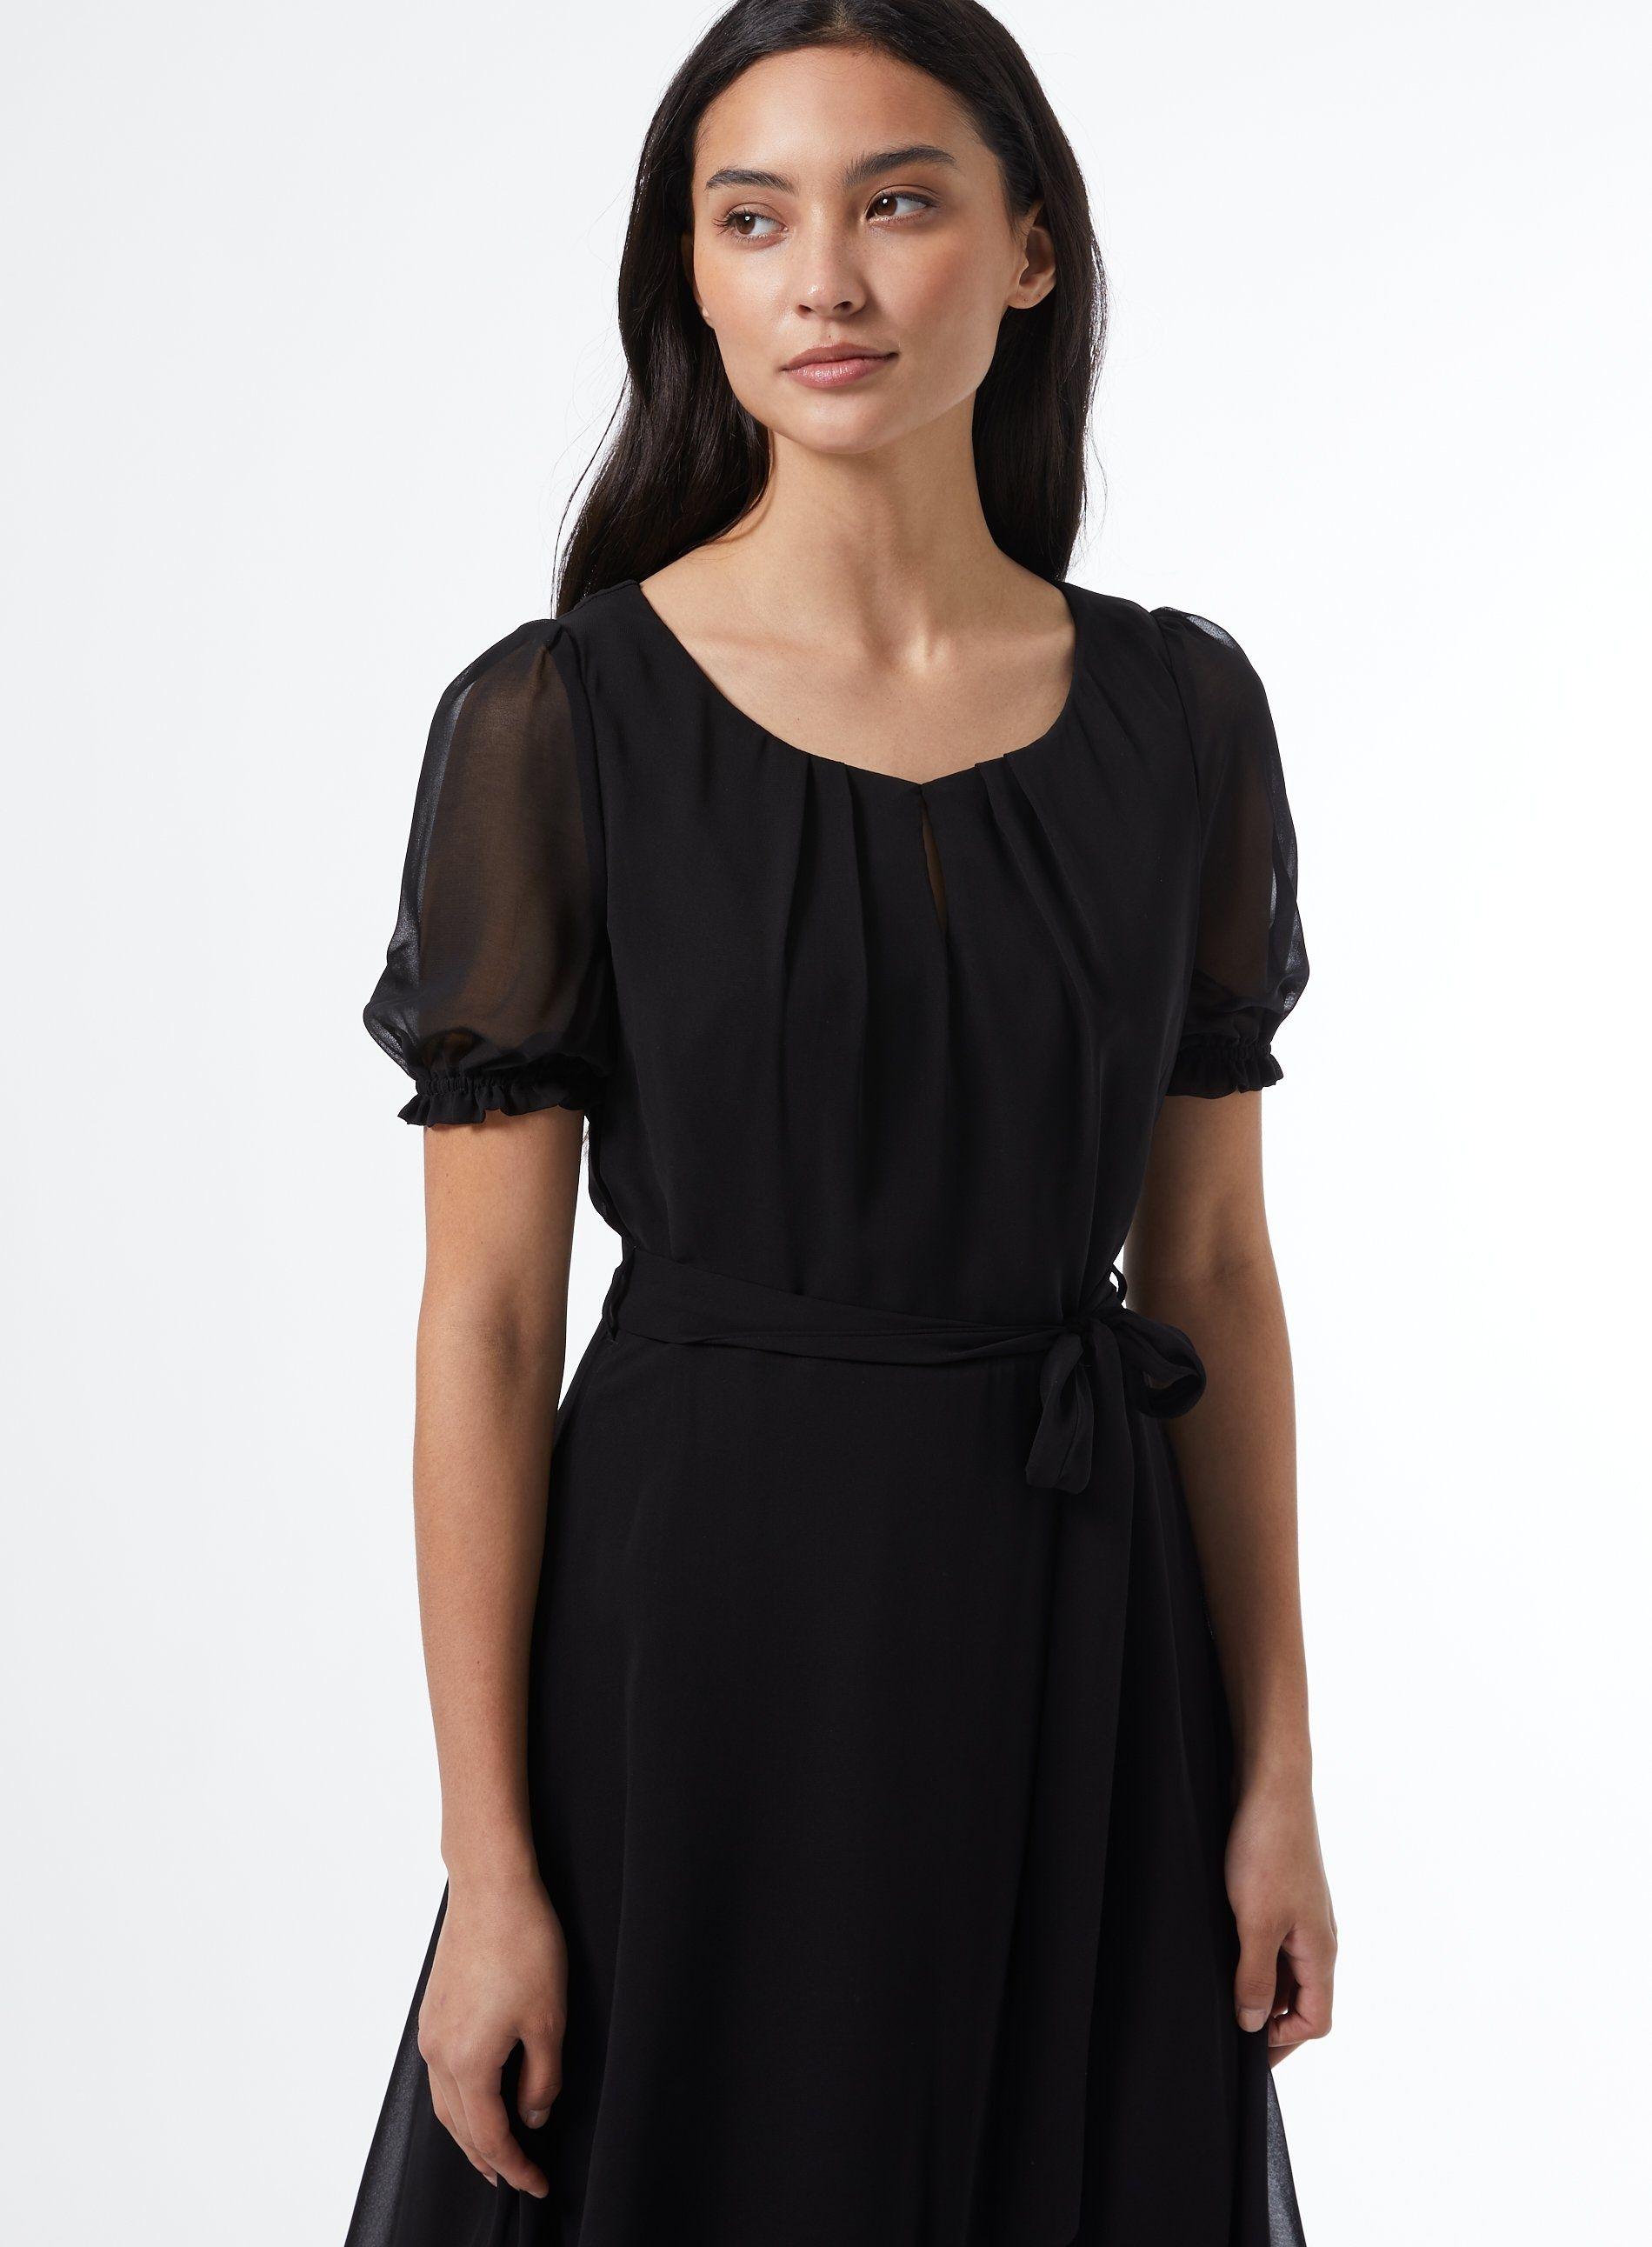 Dorothy Perkins Womens Billie & Blossom Petite Black Key Hole Dress Short Sleeve